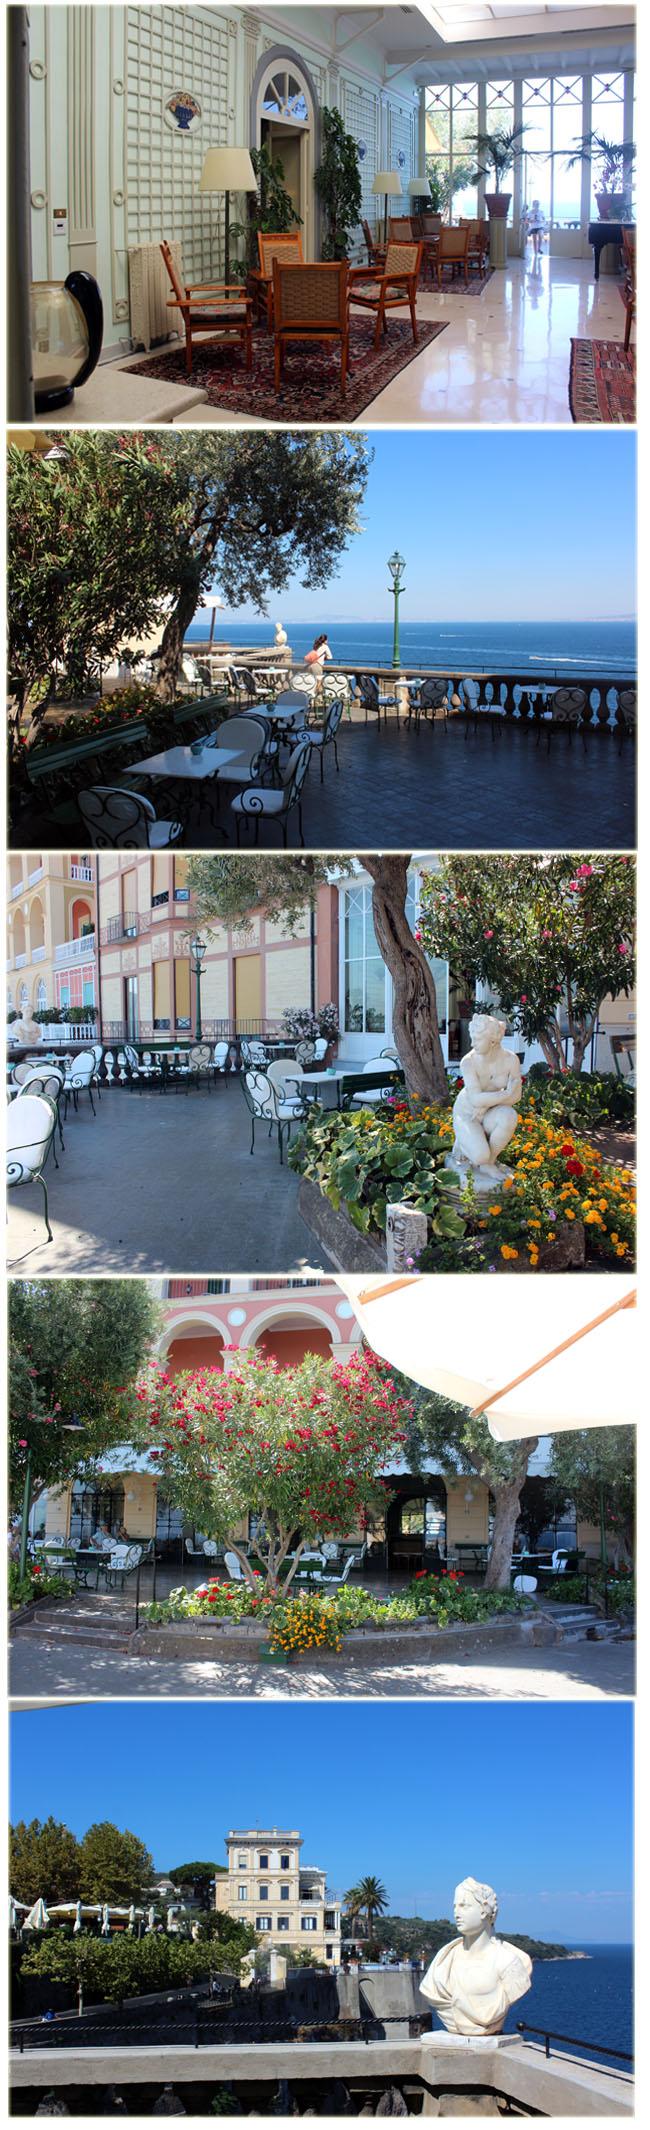 excelsior vittoria, sorrento, hoteis em sorrento, the leading hotels of the world, costa amalfitana, hotels na costa amalfitana, verao europeu, restaurants em sorrento,